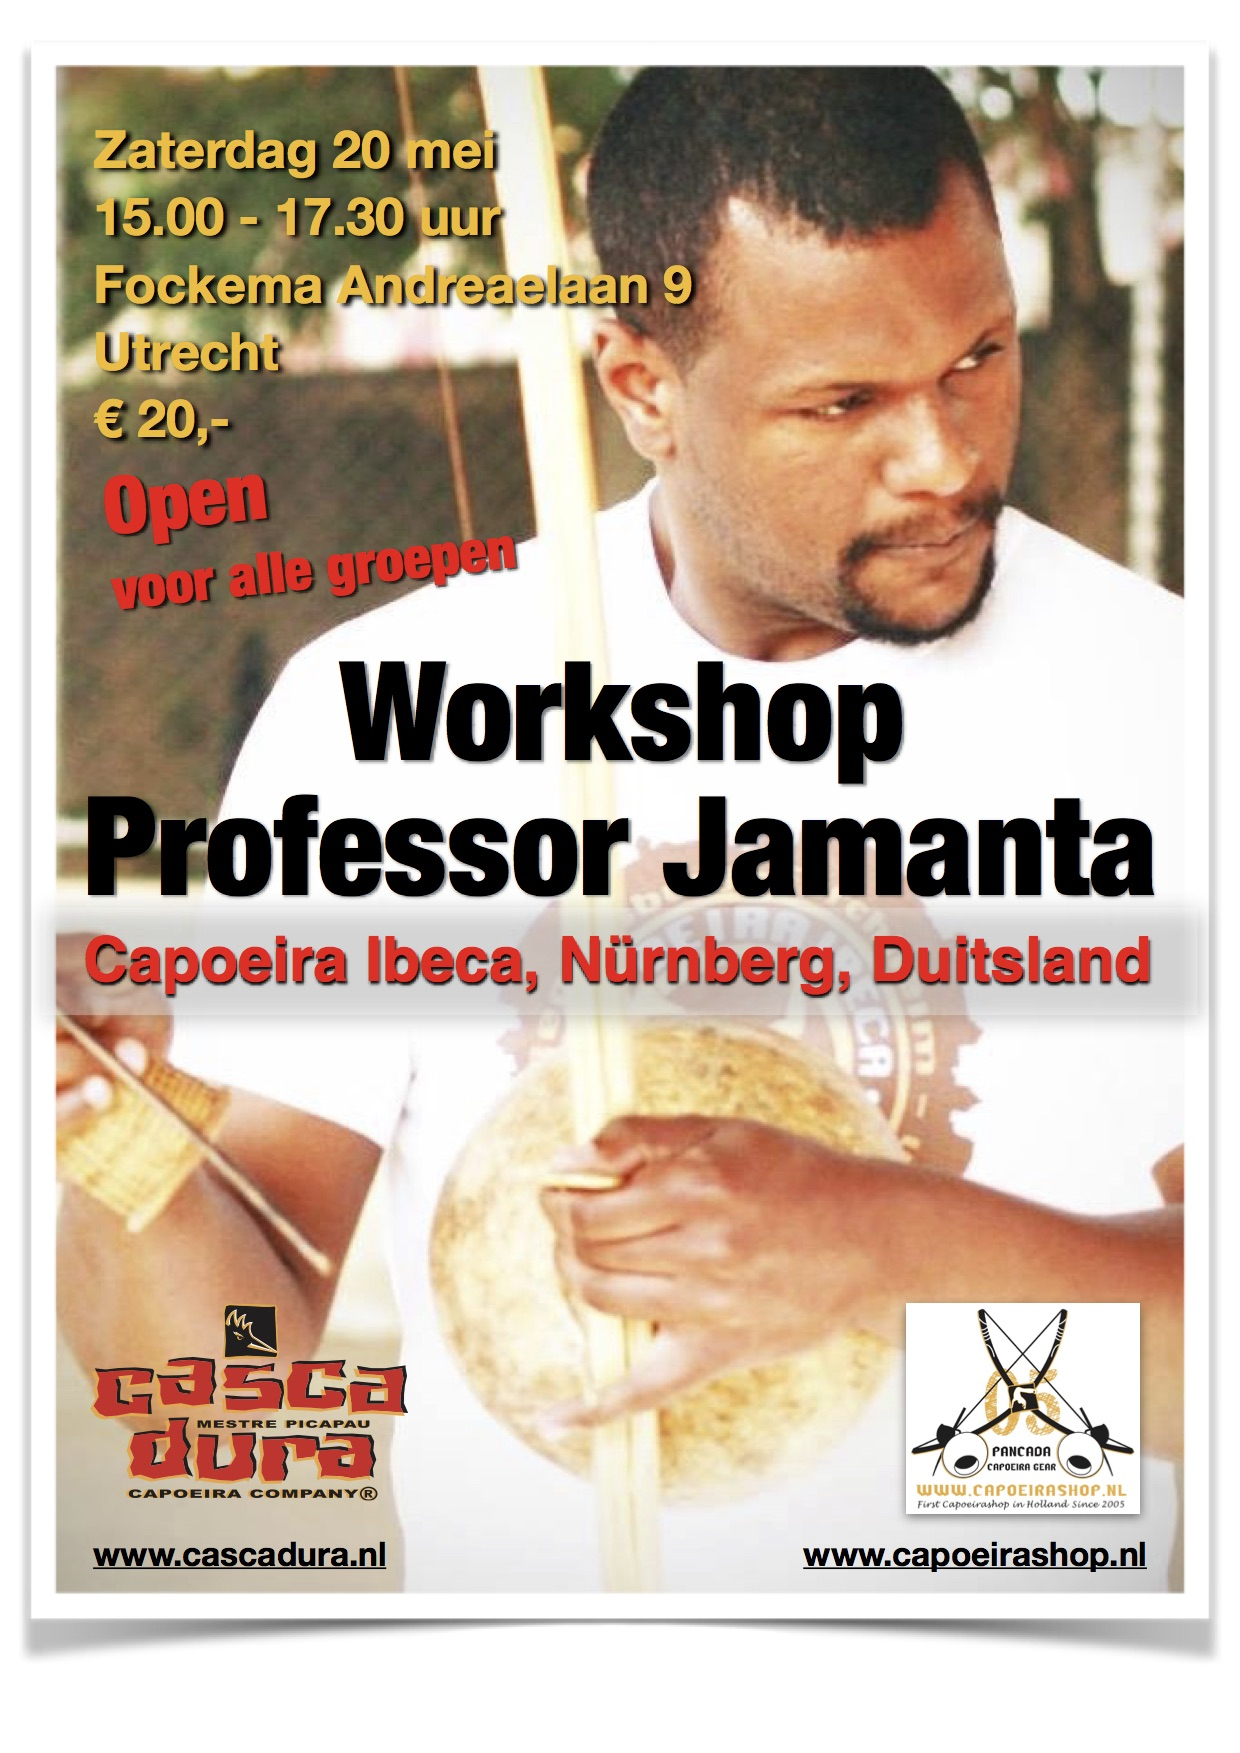 P.Jamanta